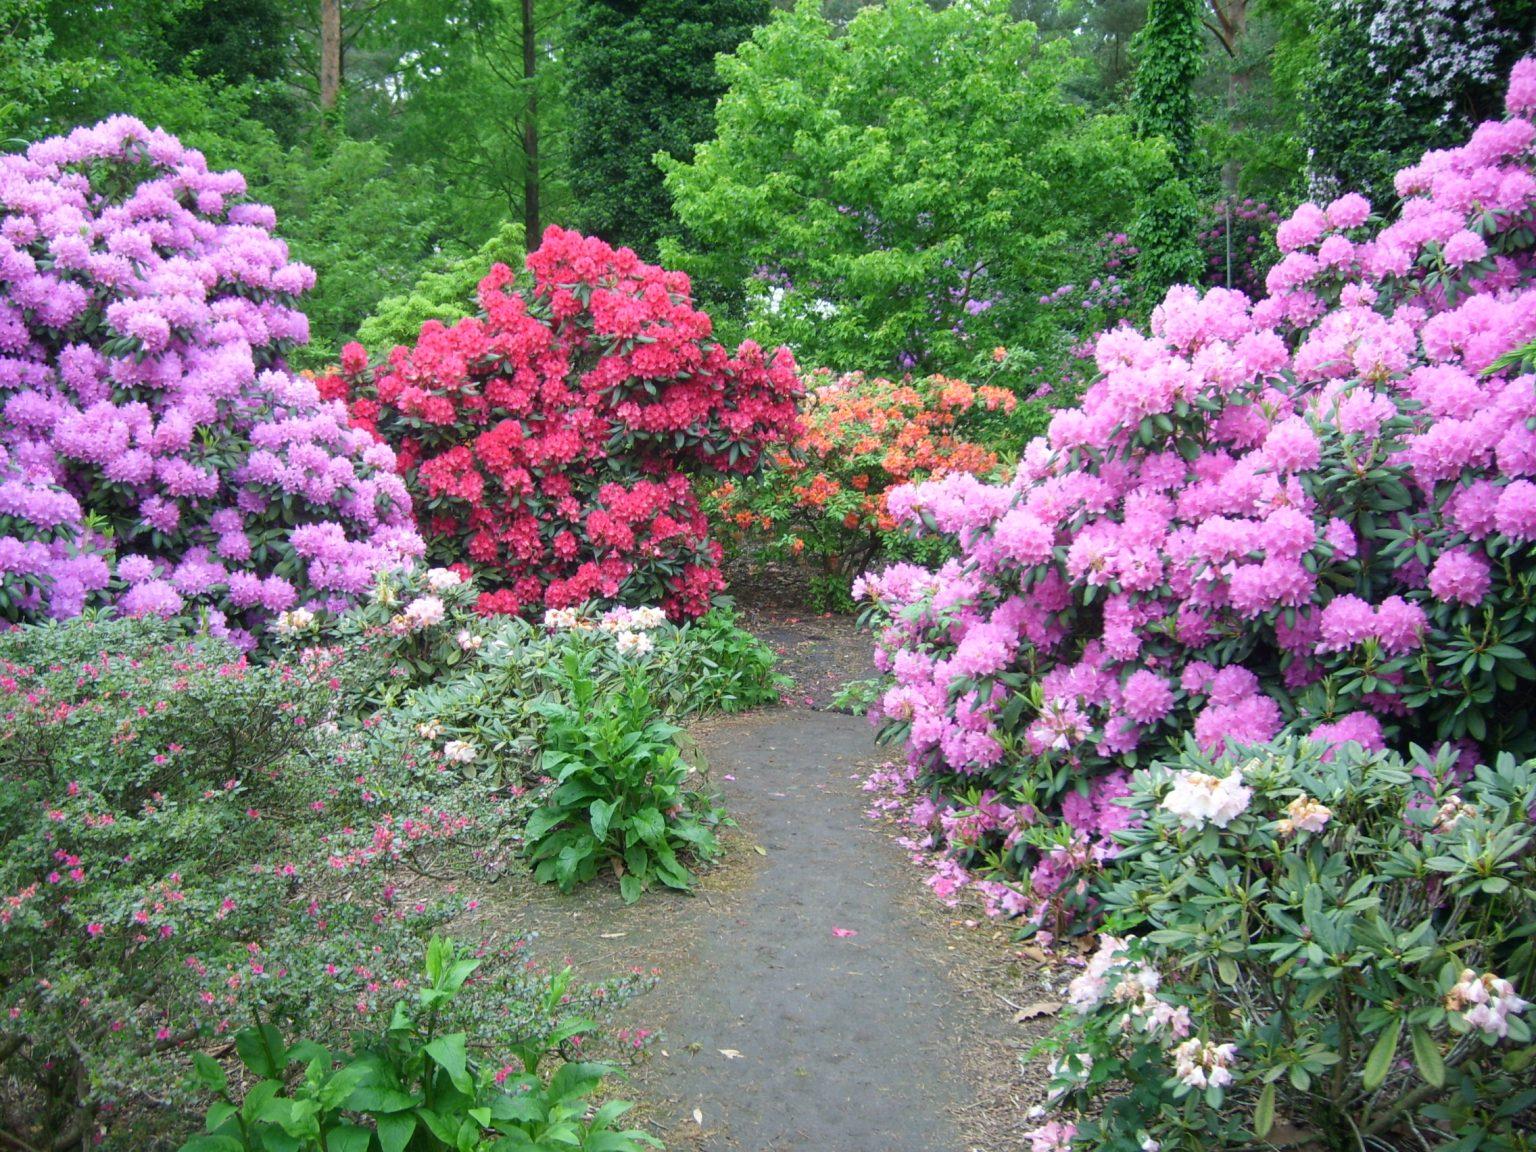 2009 - 05 Rhododendronpark Gristede_9 Kopie